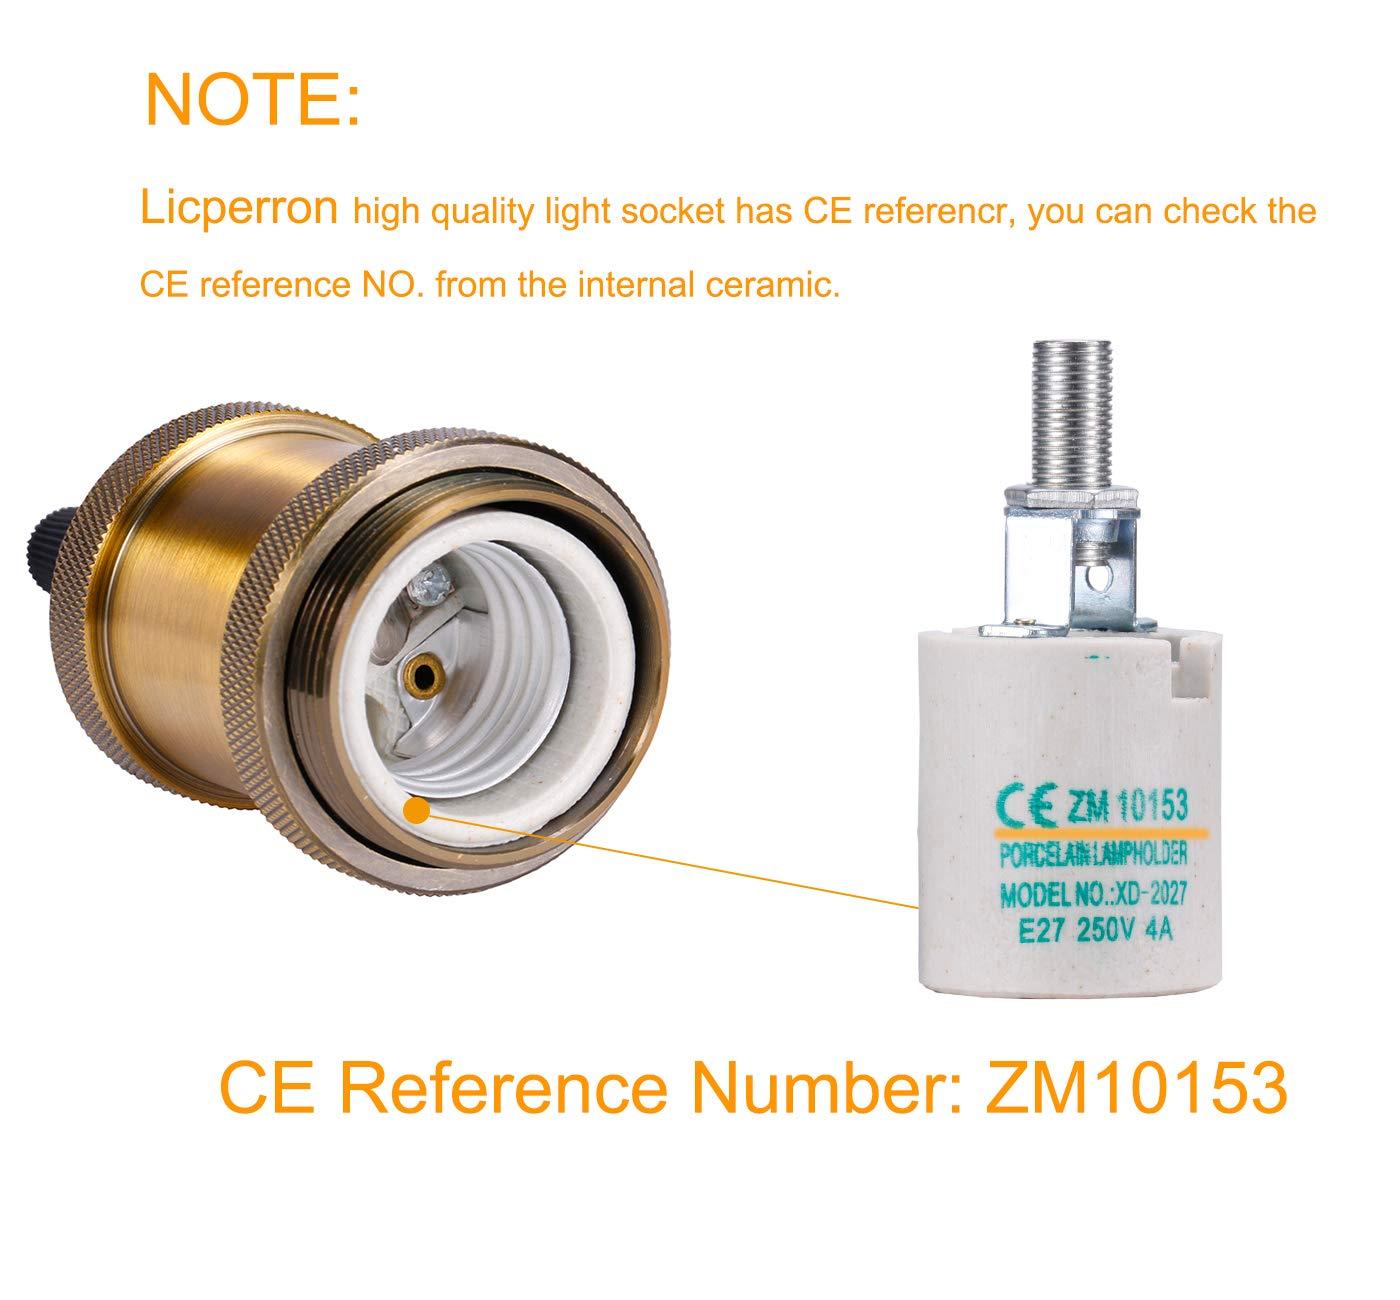 Keramik Lampenfassung Licperron E26//E27/Lampensockel massive Messing Fassung Gl/ühbirnen-Adapter 2/St/ück 2er-Pack 220.0volts